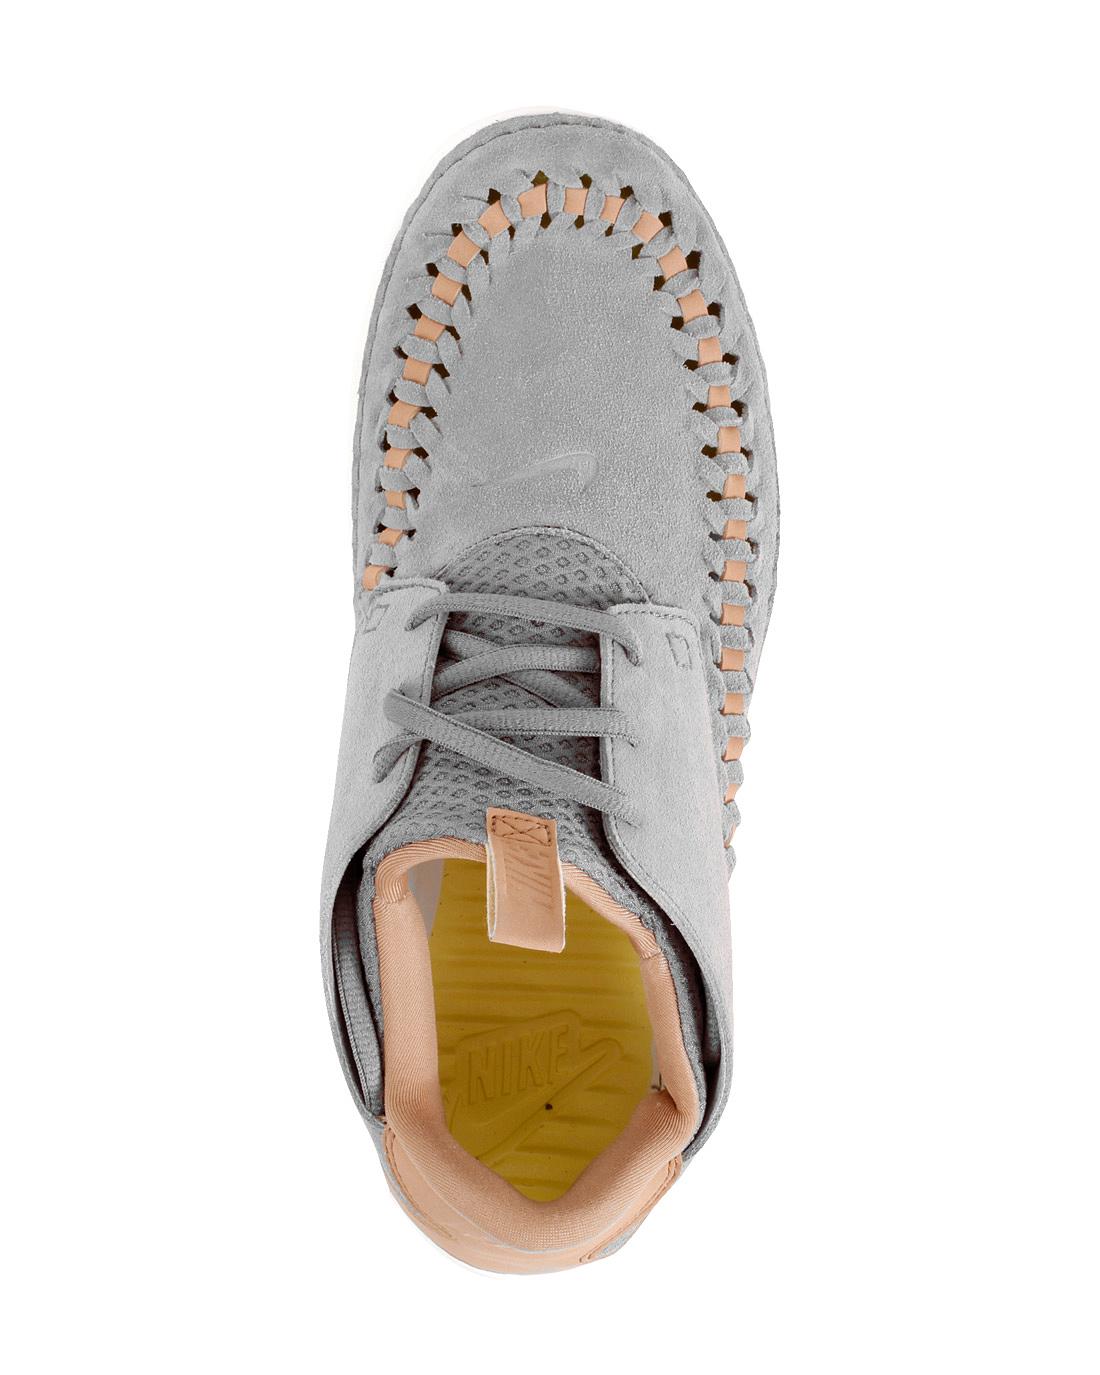 Nike Solarsoft Woven Moccasin PRM 'Sport Grey'